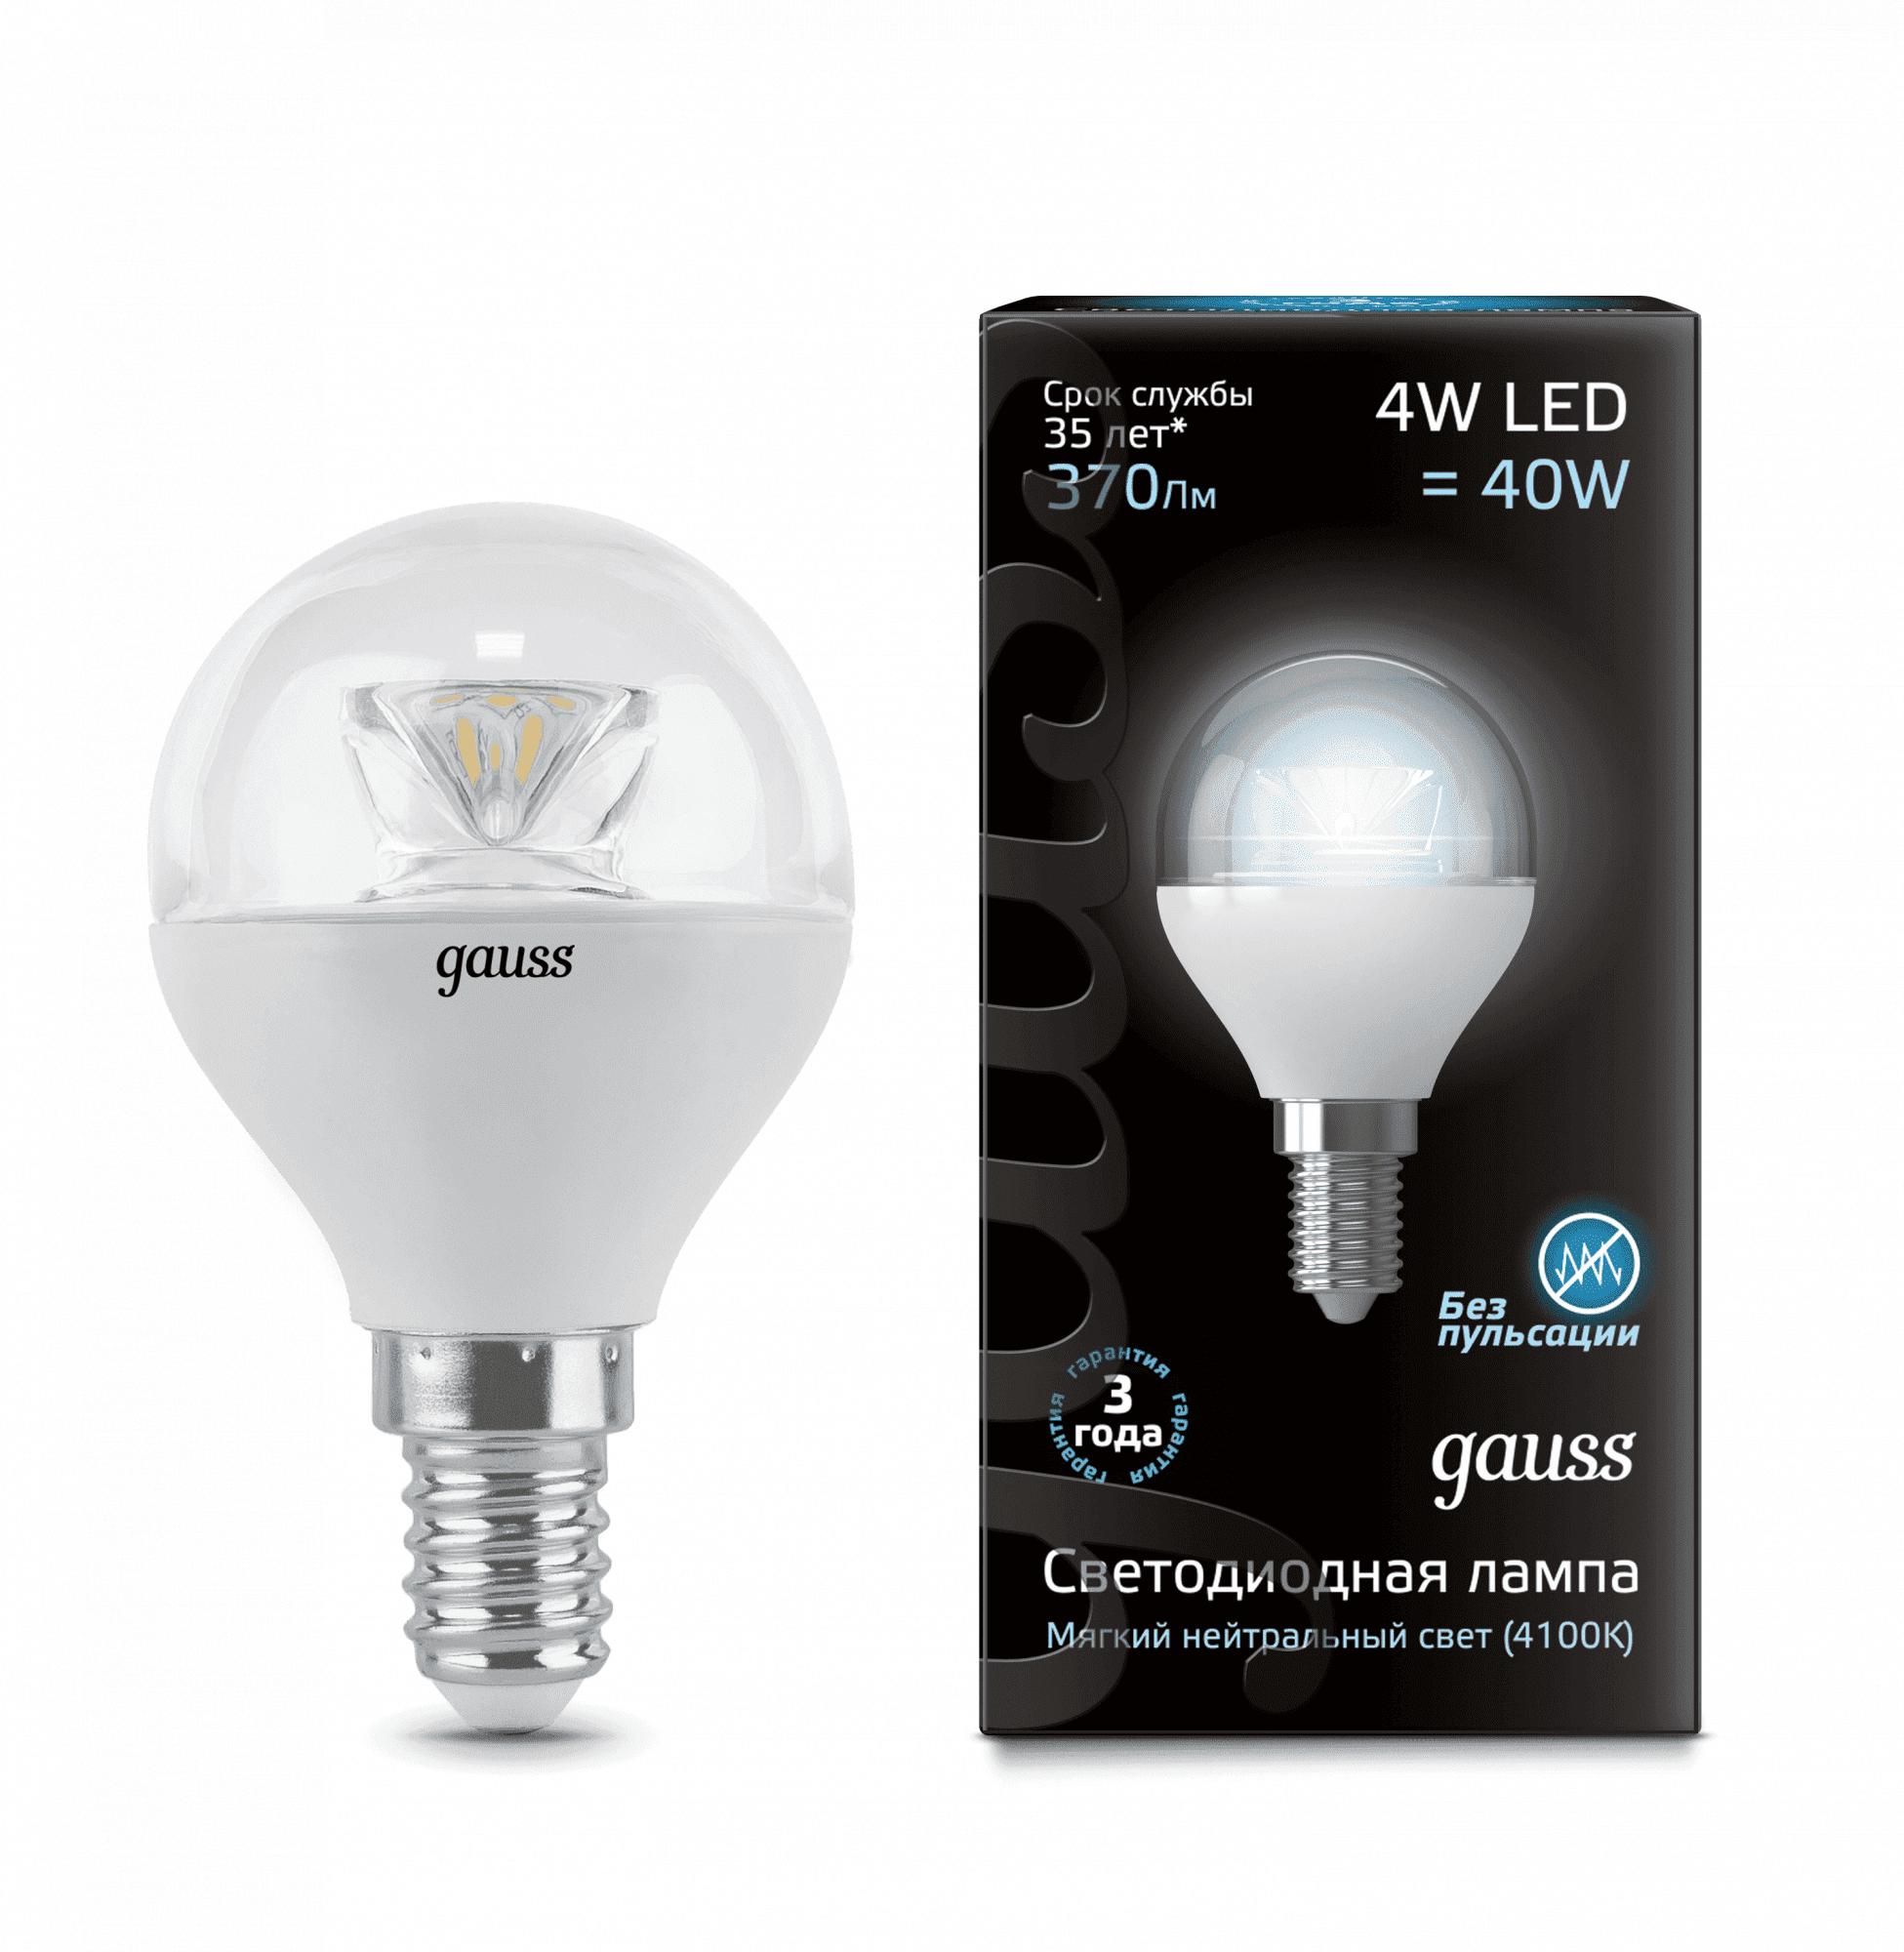 Gauss LED Globe Crystal Clear E14 4W 4100K 1/10/50 арт. 105201204